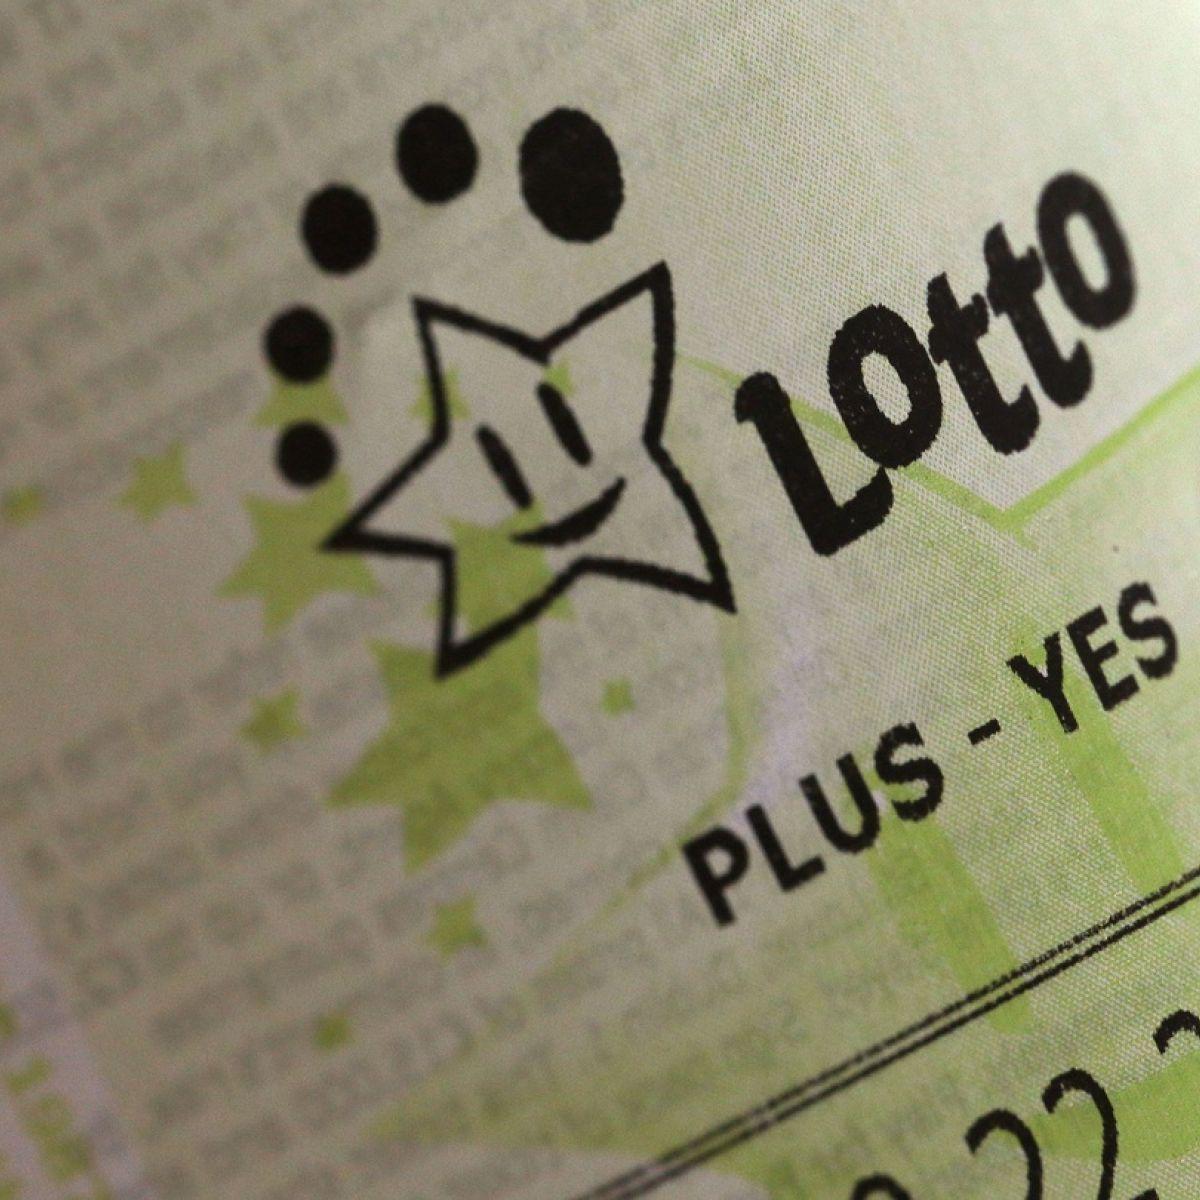 One lucky winner of €10m Lotto jackpot